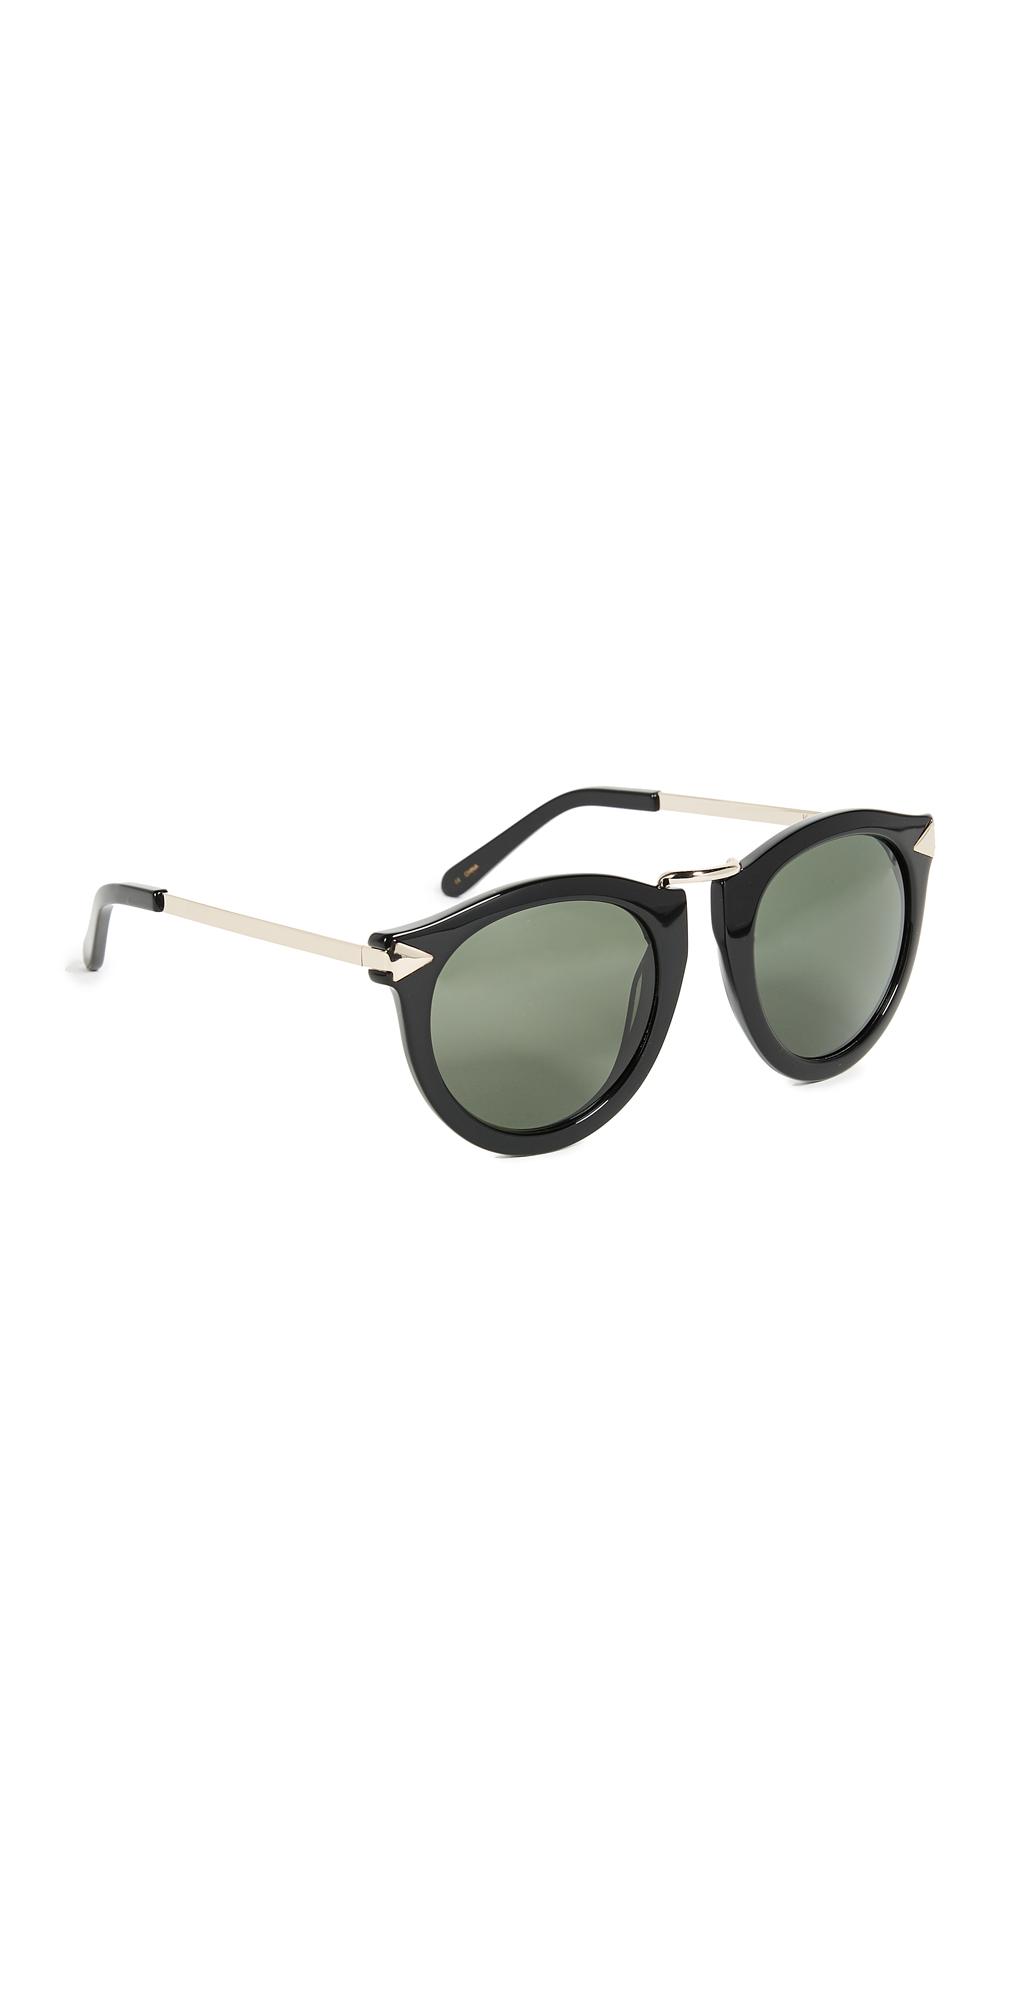 The Harvest Sunglasses